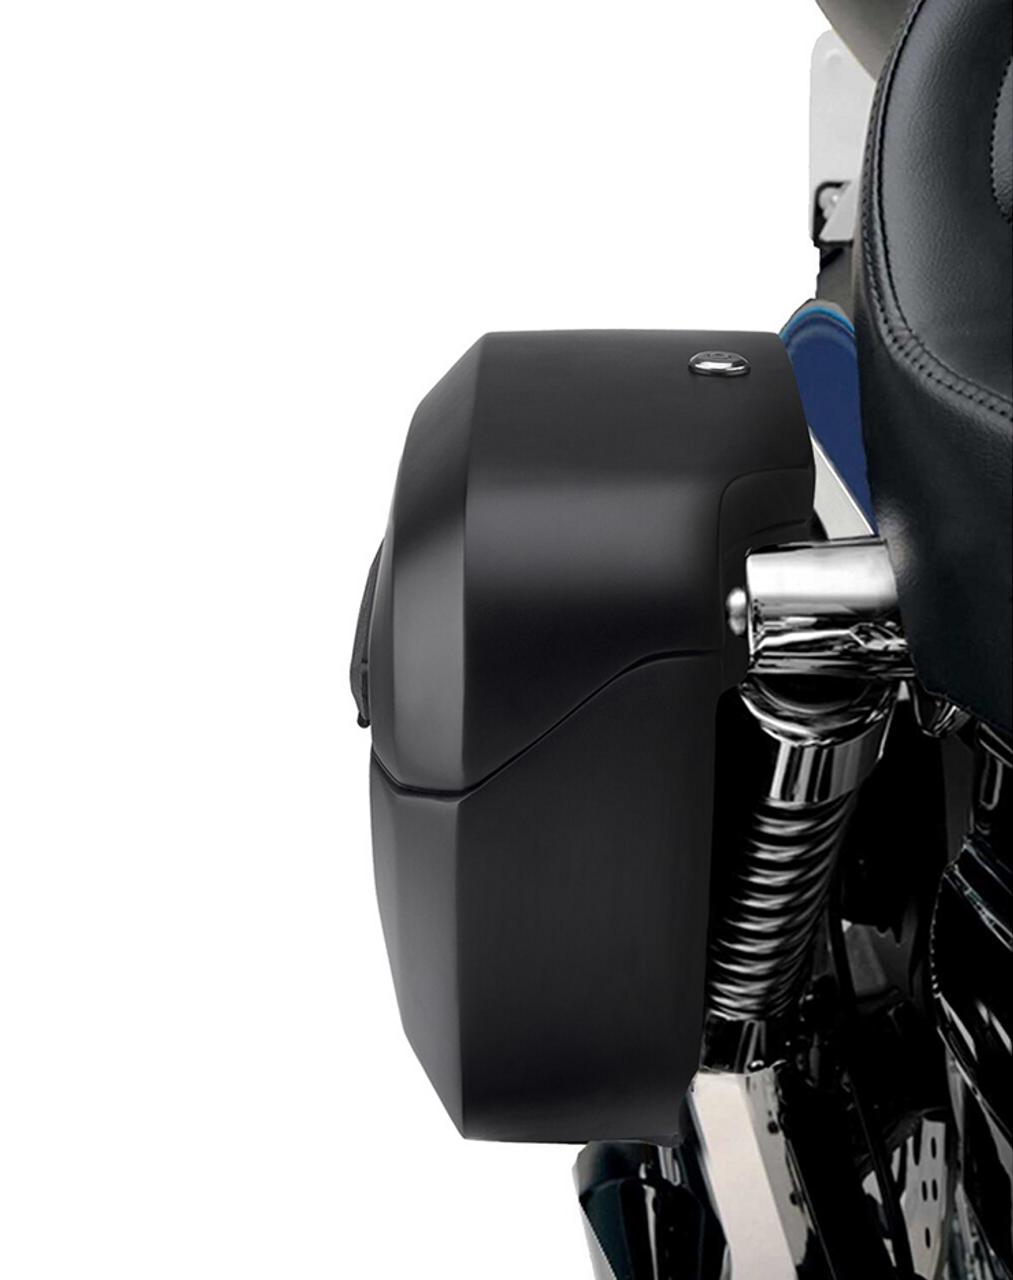 Viking Lamellar Shock Cutout Large Matte Motorcycle Hard Saddlebags For Kawasaki Vulcan 900 Custom Shock Cutout View